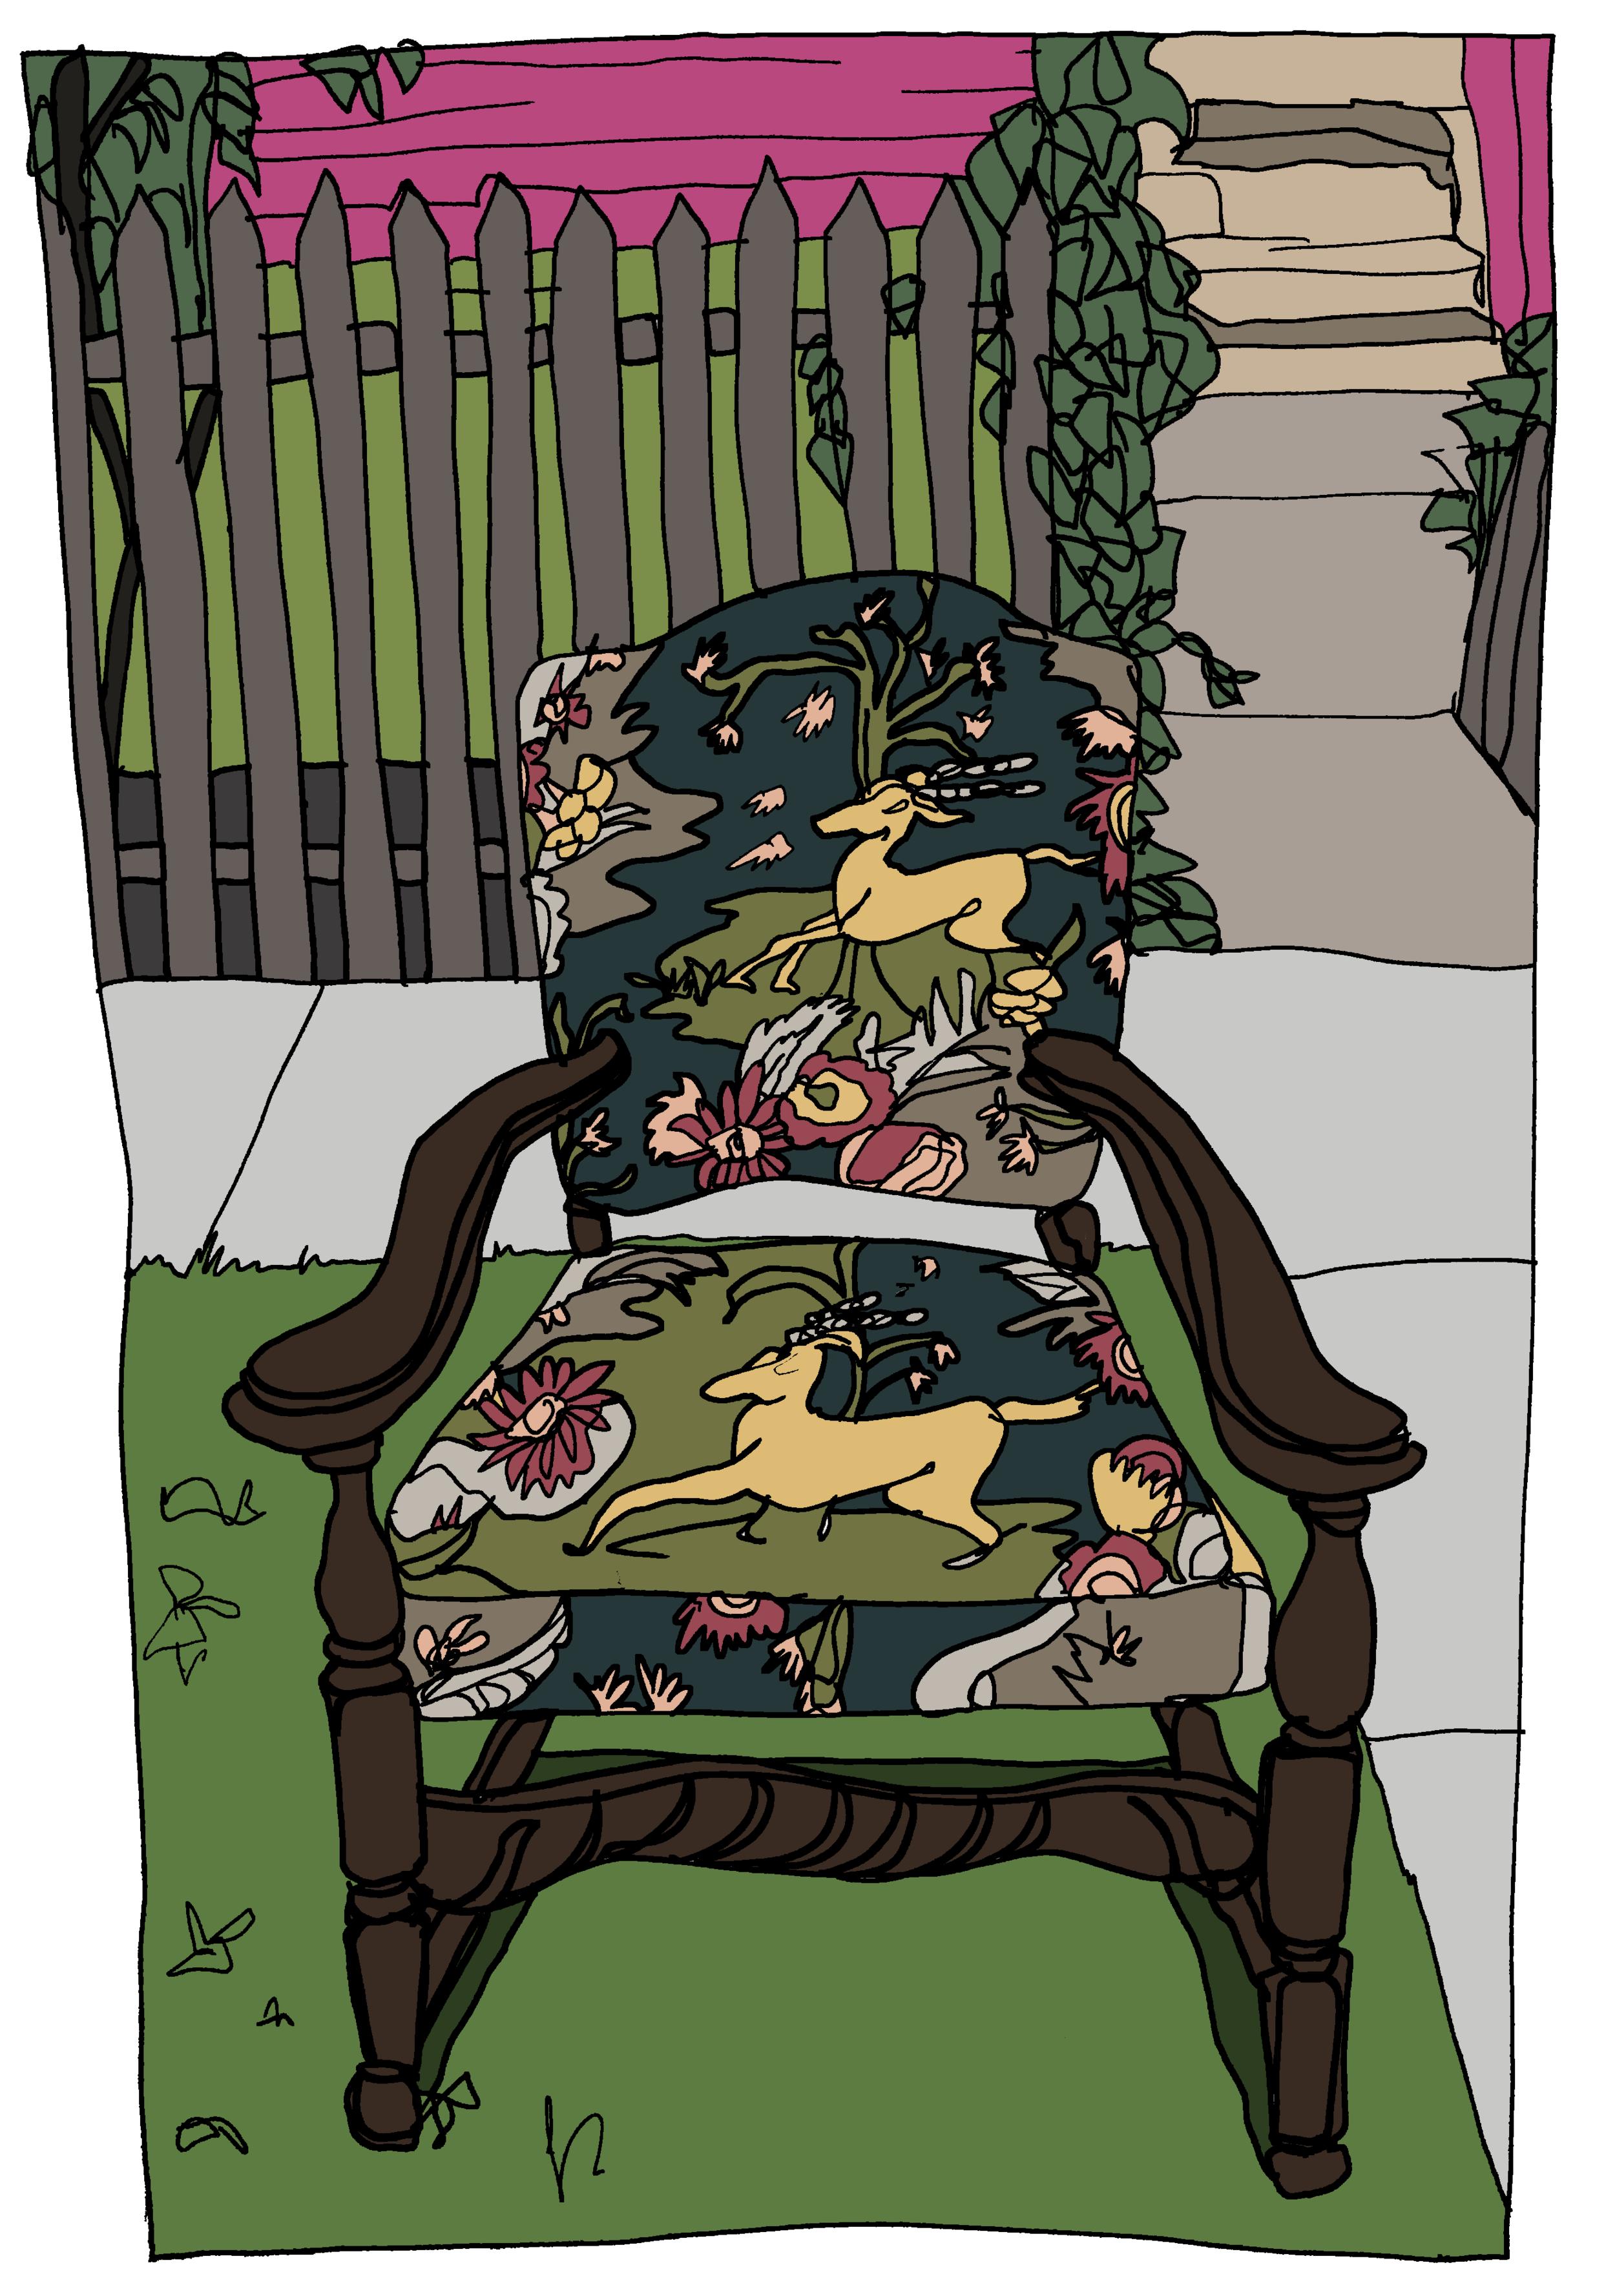 Chair Left Outside